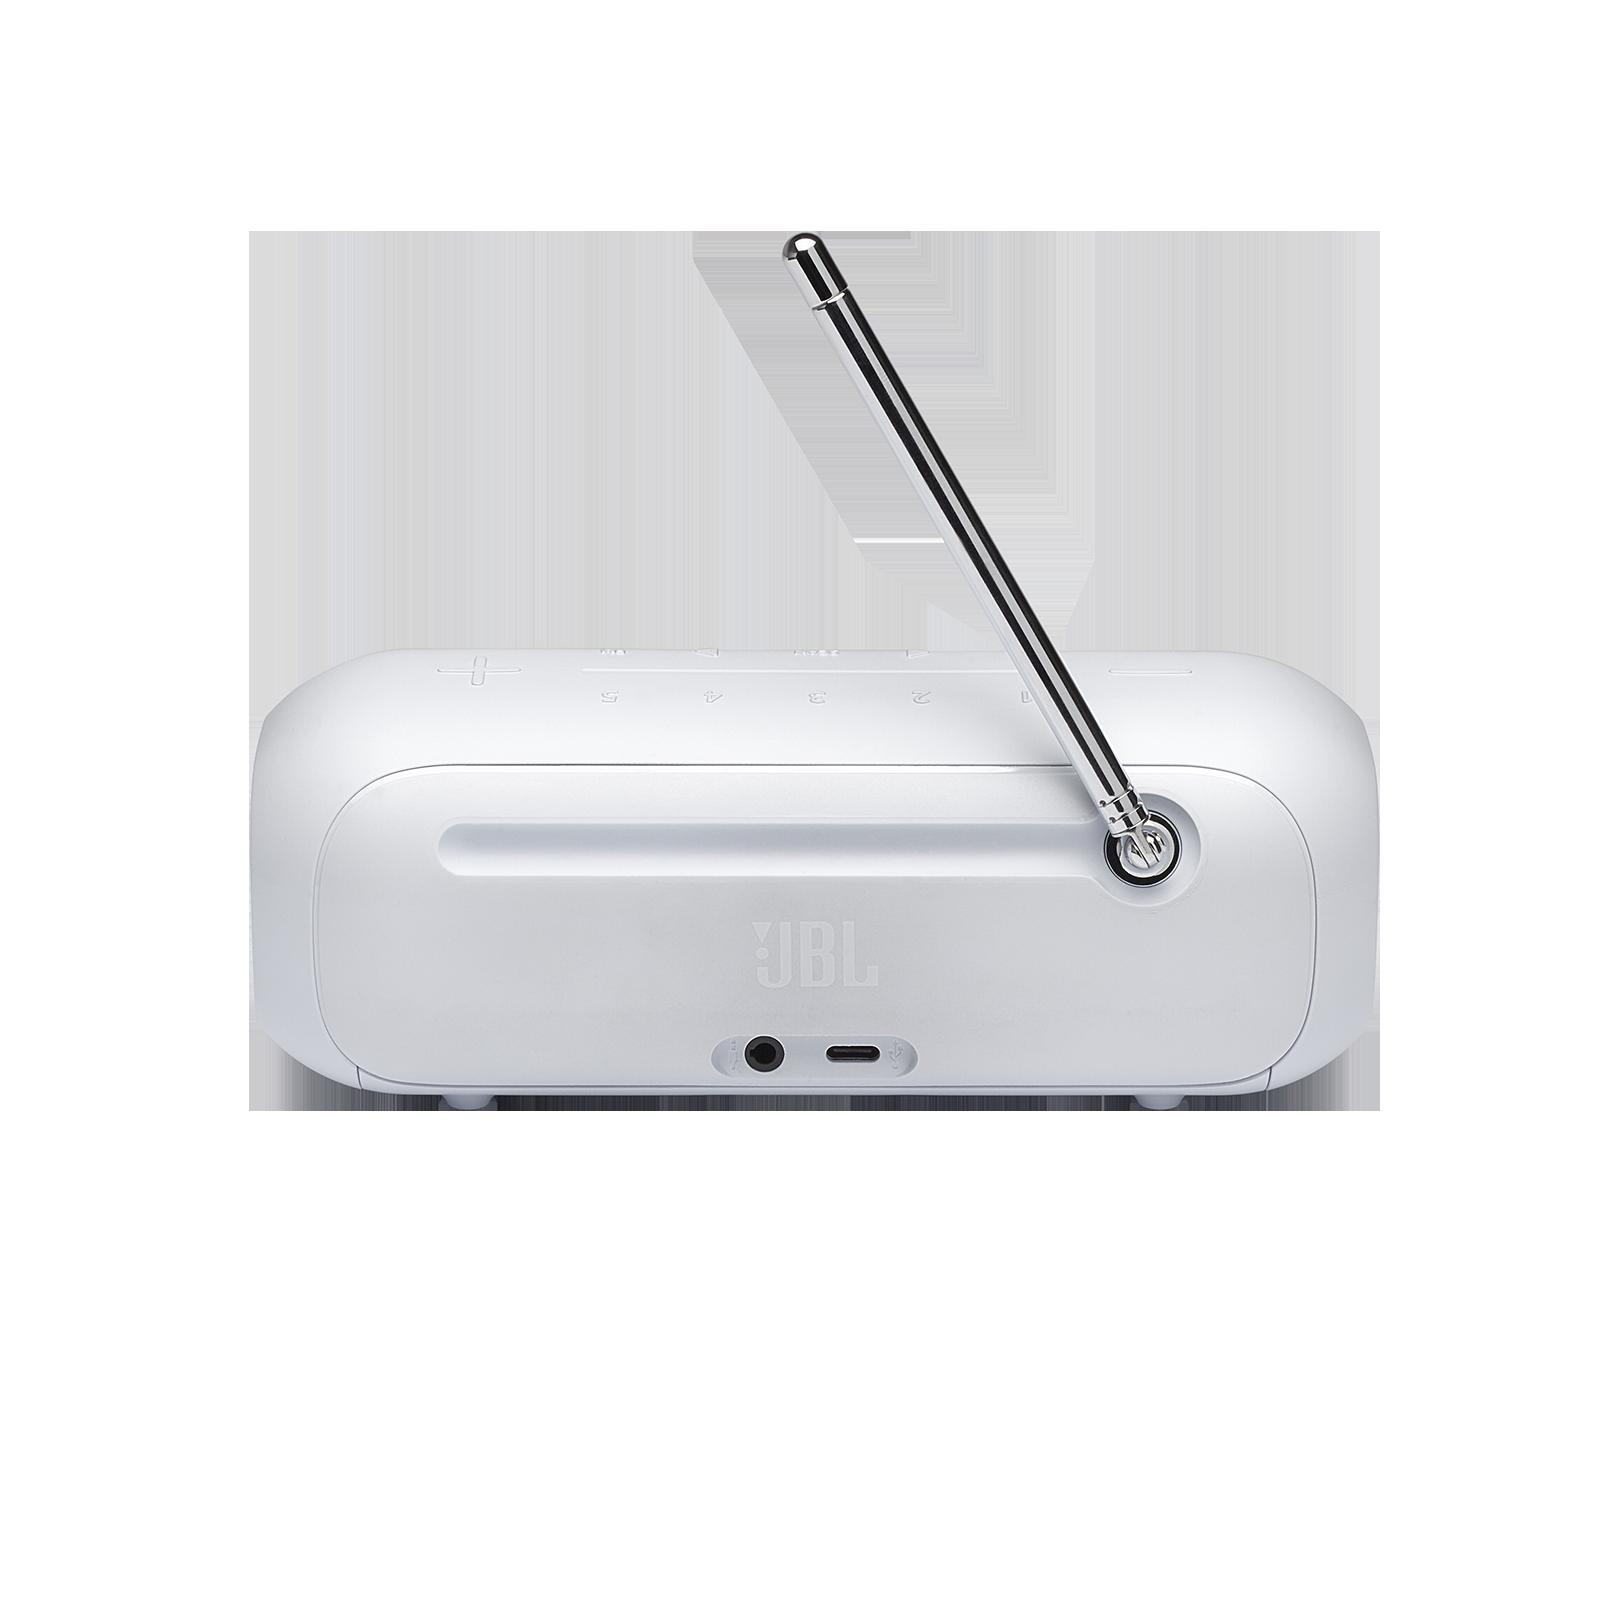 JBL Tuner 2 FM - White - Portable FM radio with Bluetooth - Back